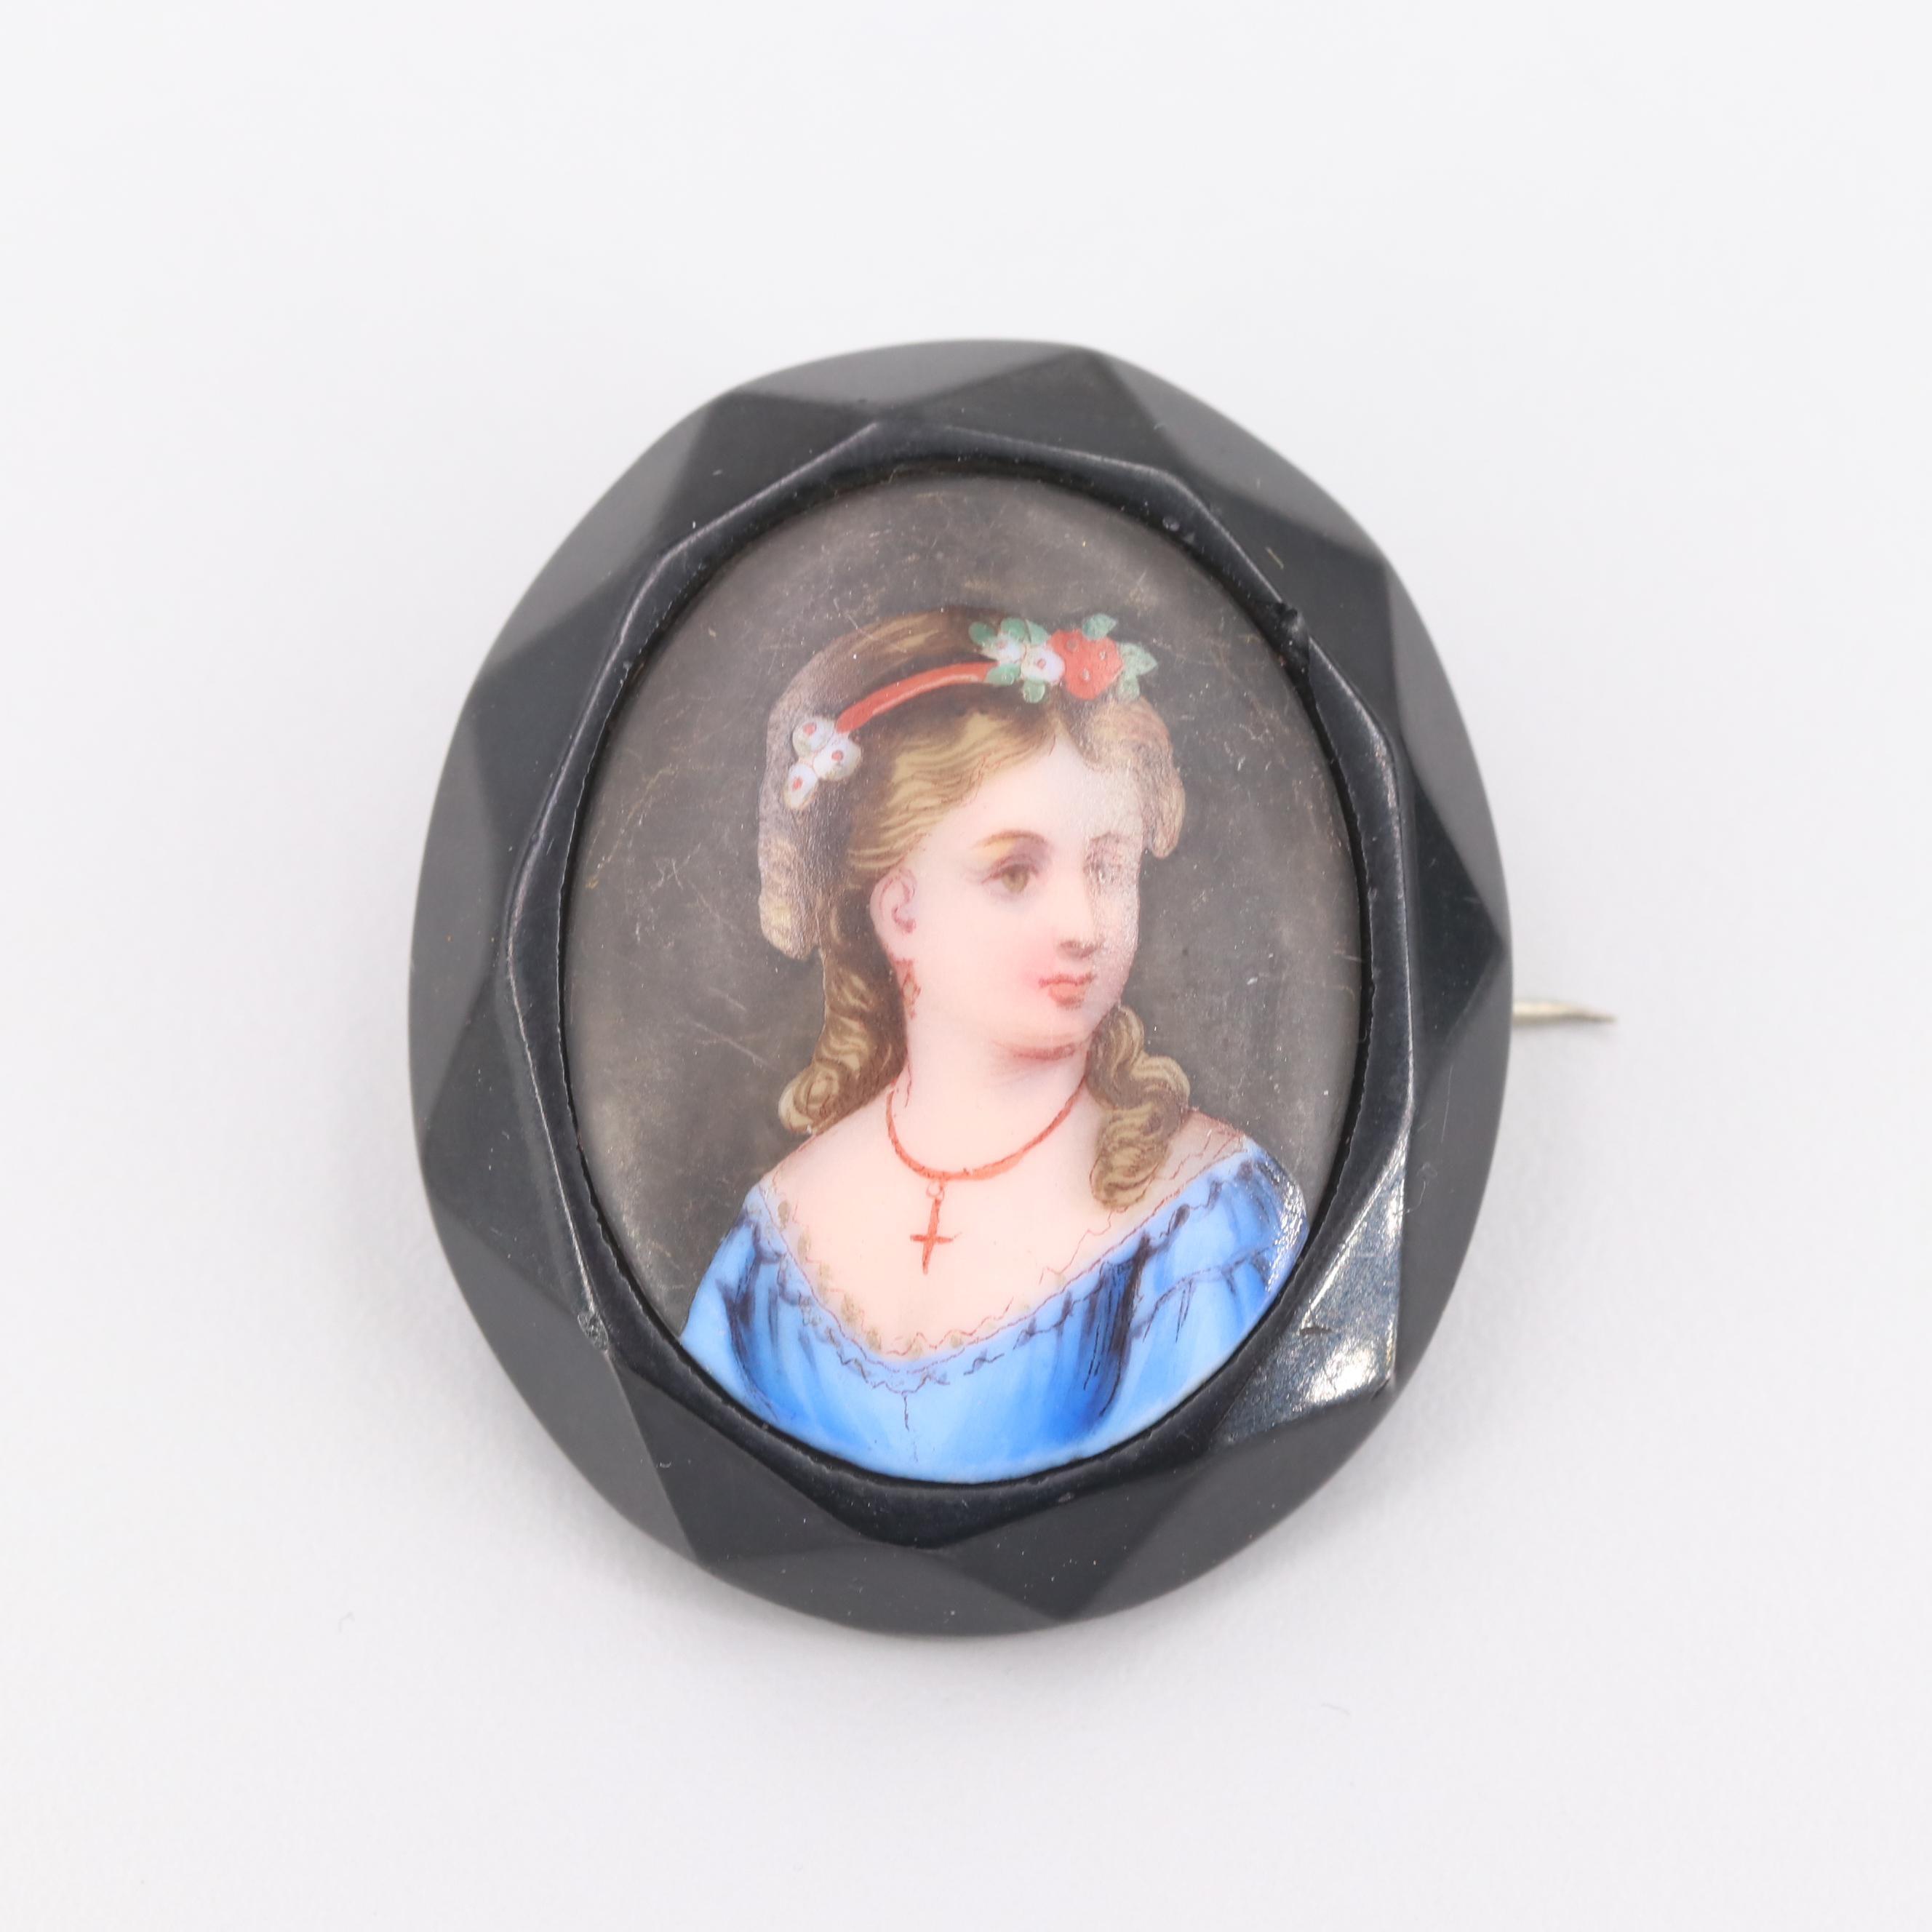 Vintage Costume Hand Painted Porcelain Brooch